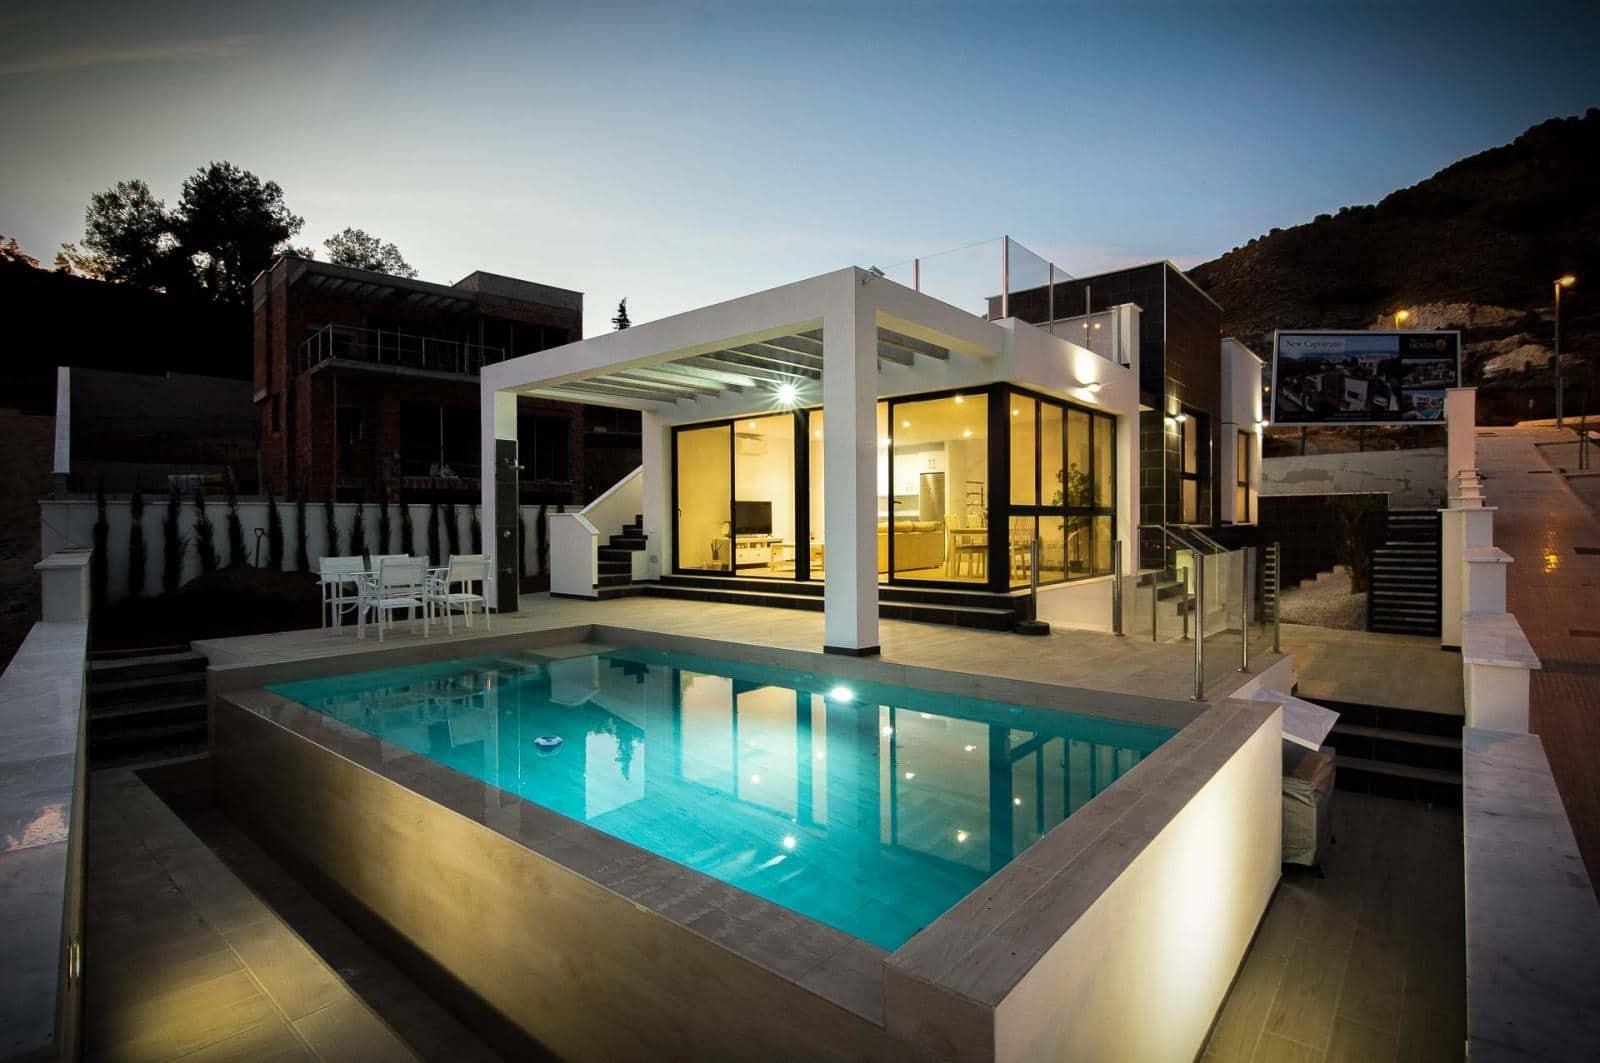 3 bedroom Villa for sale in Nerja with pool - € 490,000 (Ref: 5072492)